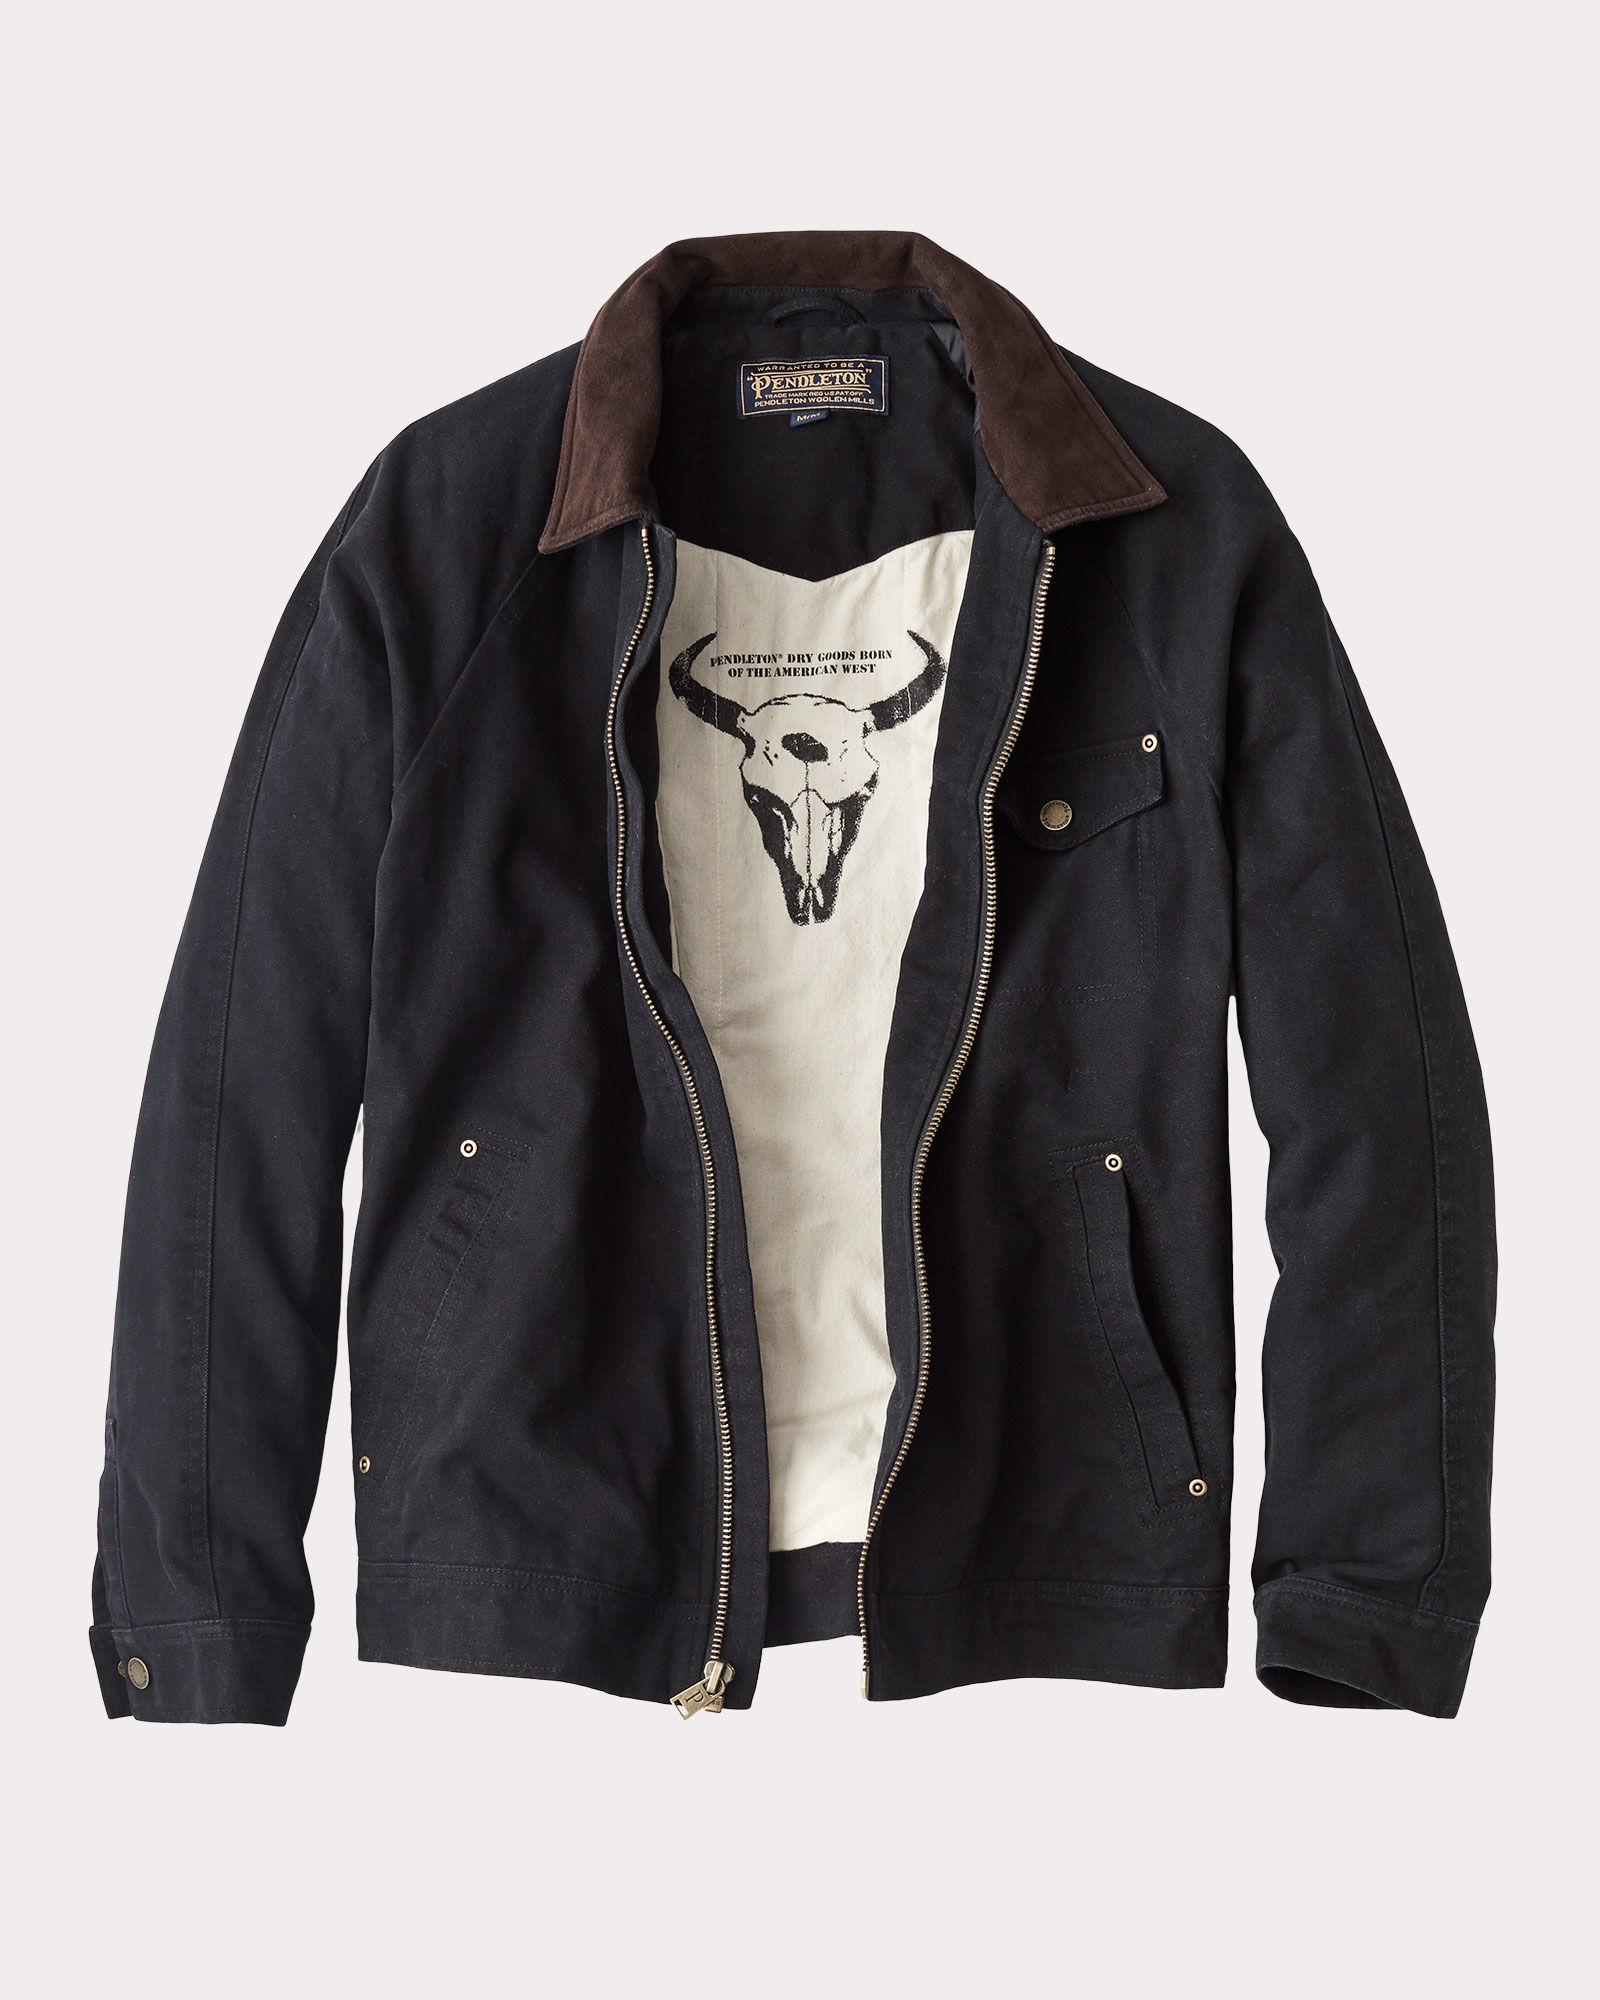 Pendleton Jacket